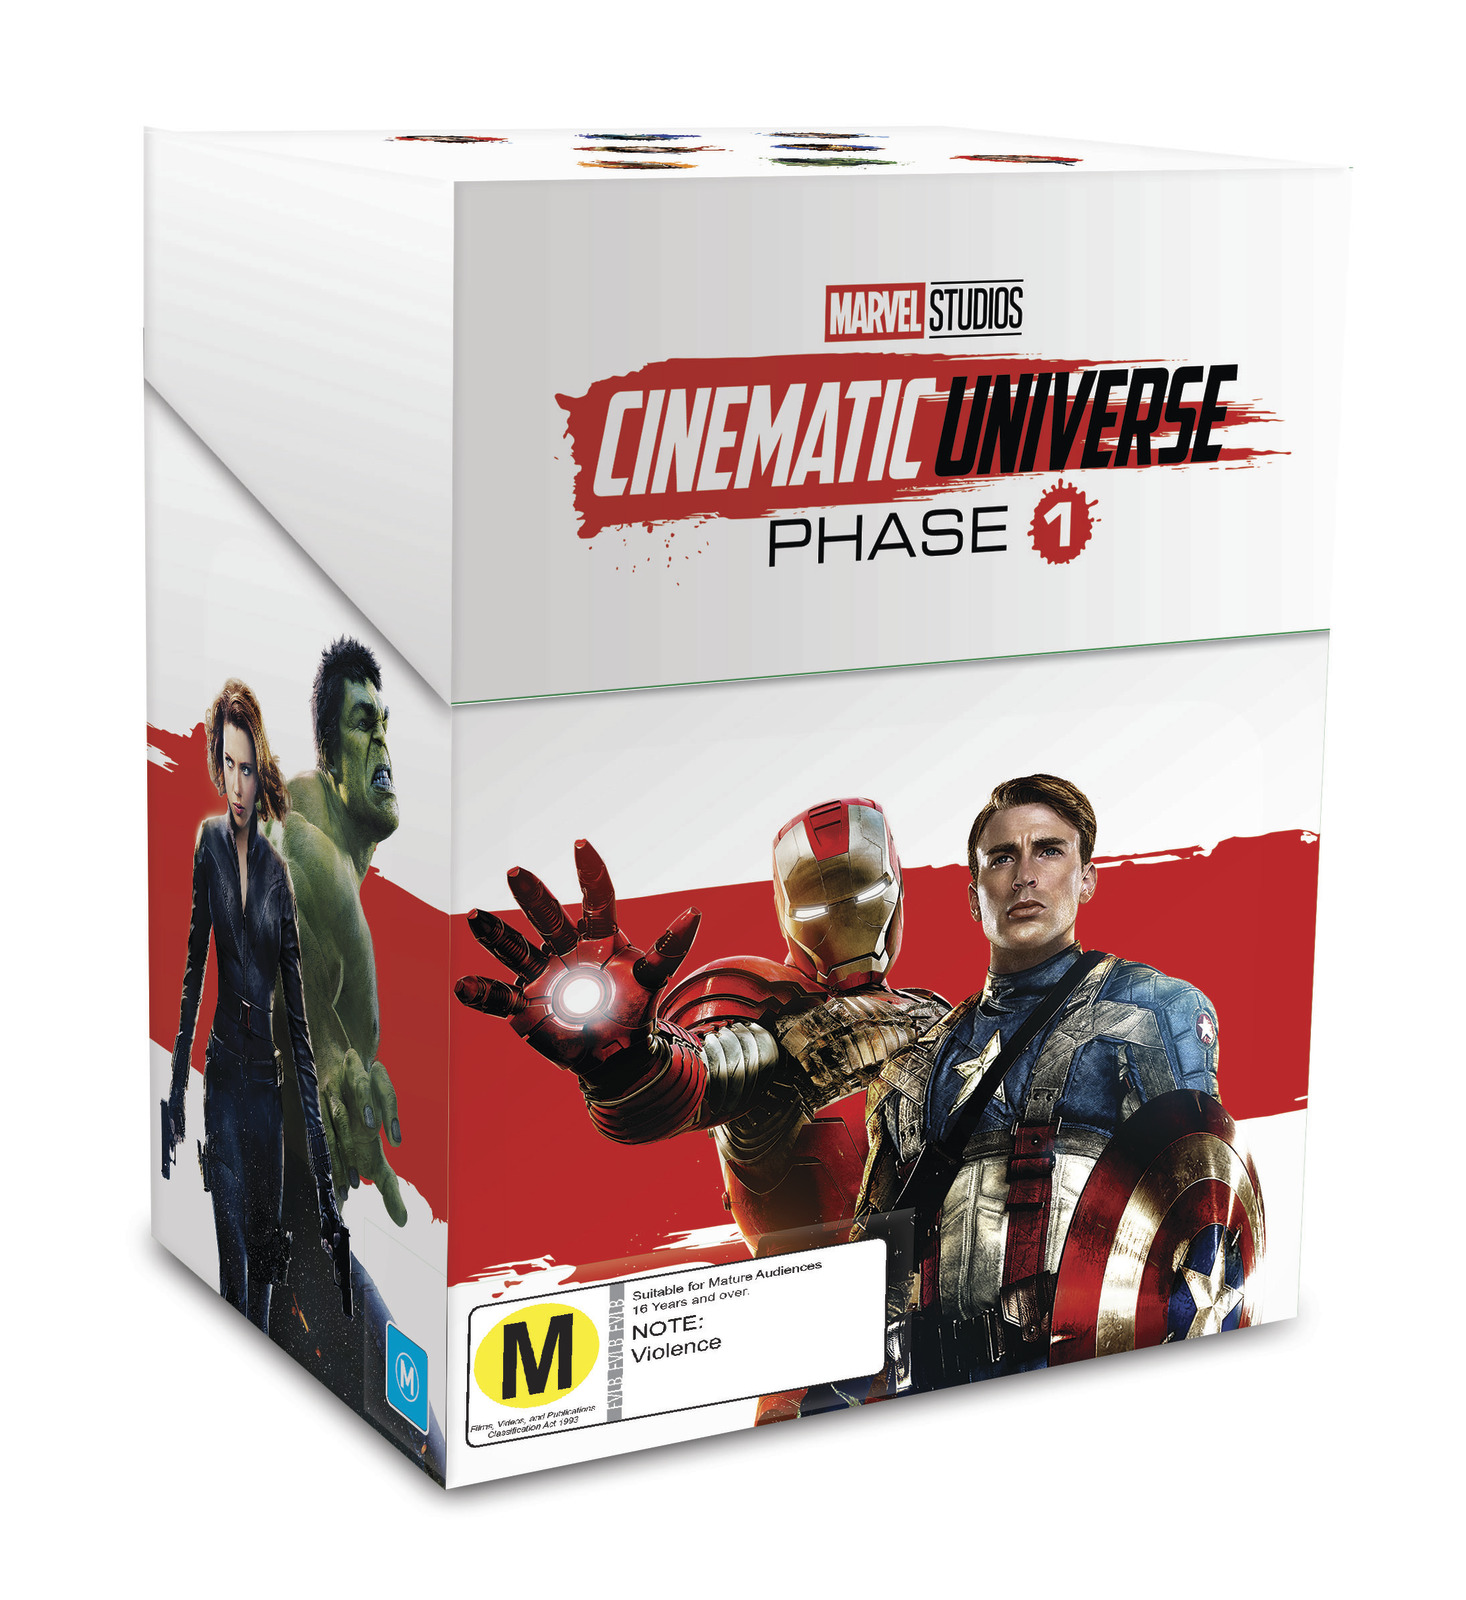 Marvel Studios: Cinematic Universe - Phase 1